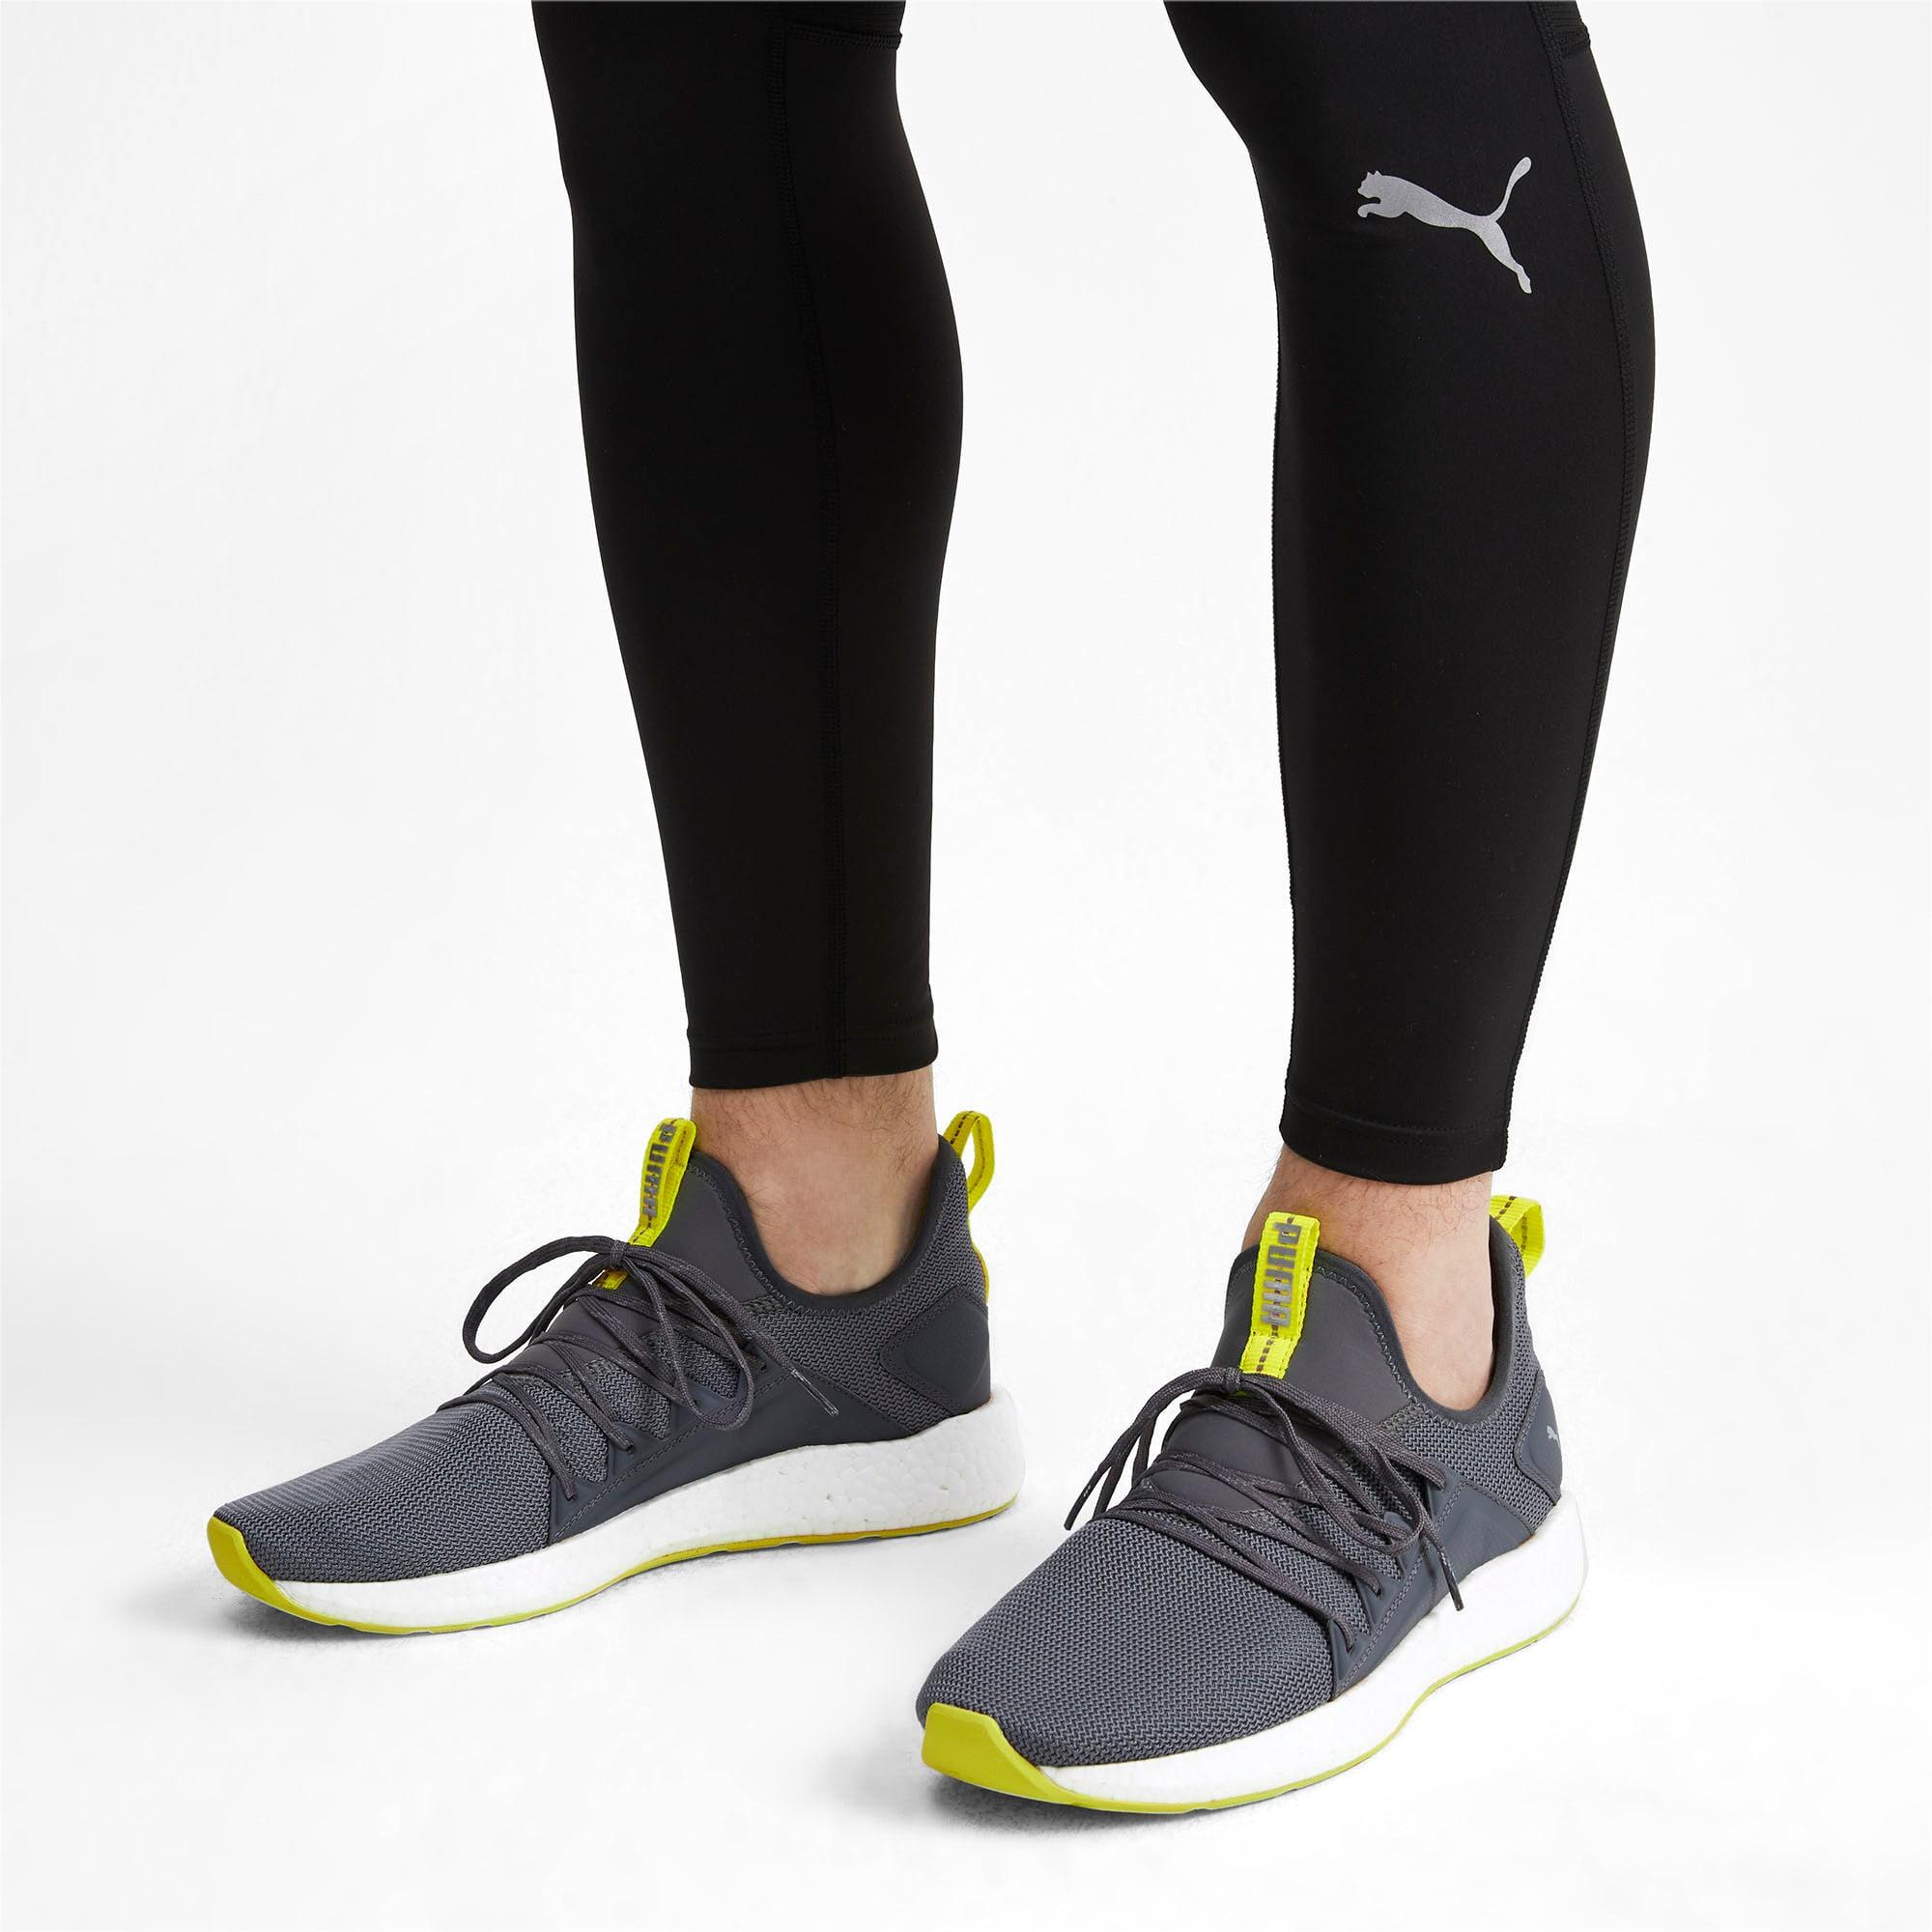 Thumbnail 2 of NRGY Neko Lights Men's Running Shoes, CASTLEROCK-Yellow Alert, medium-IND